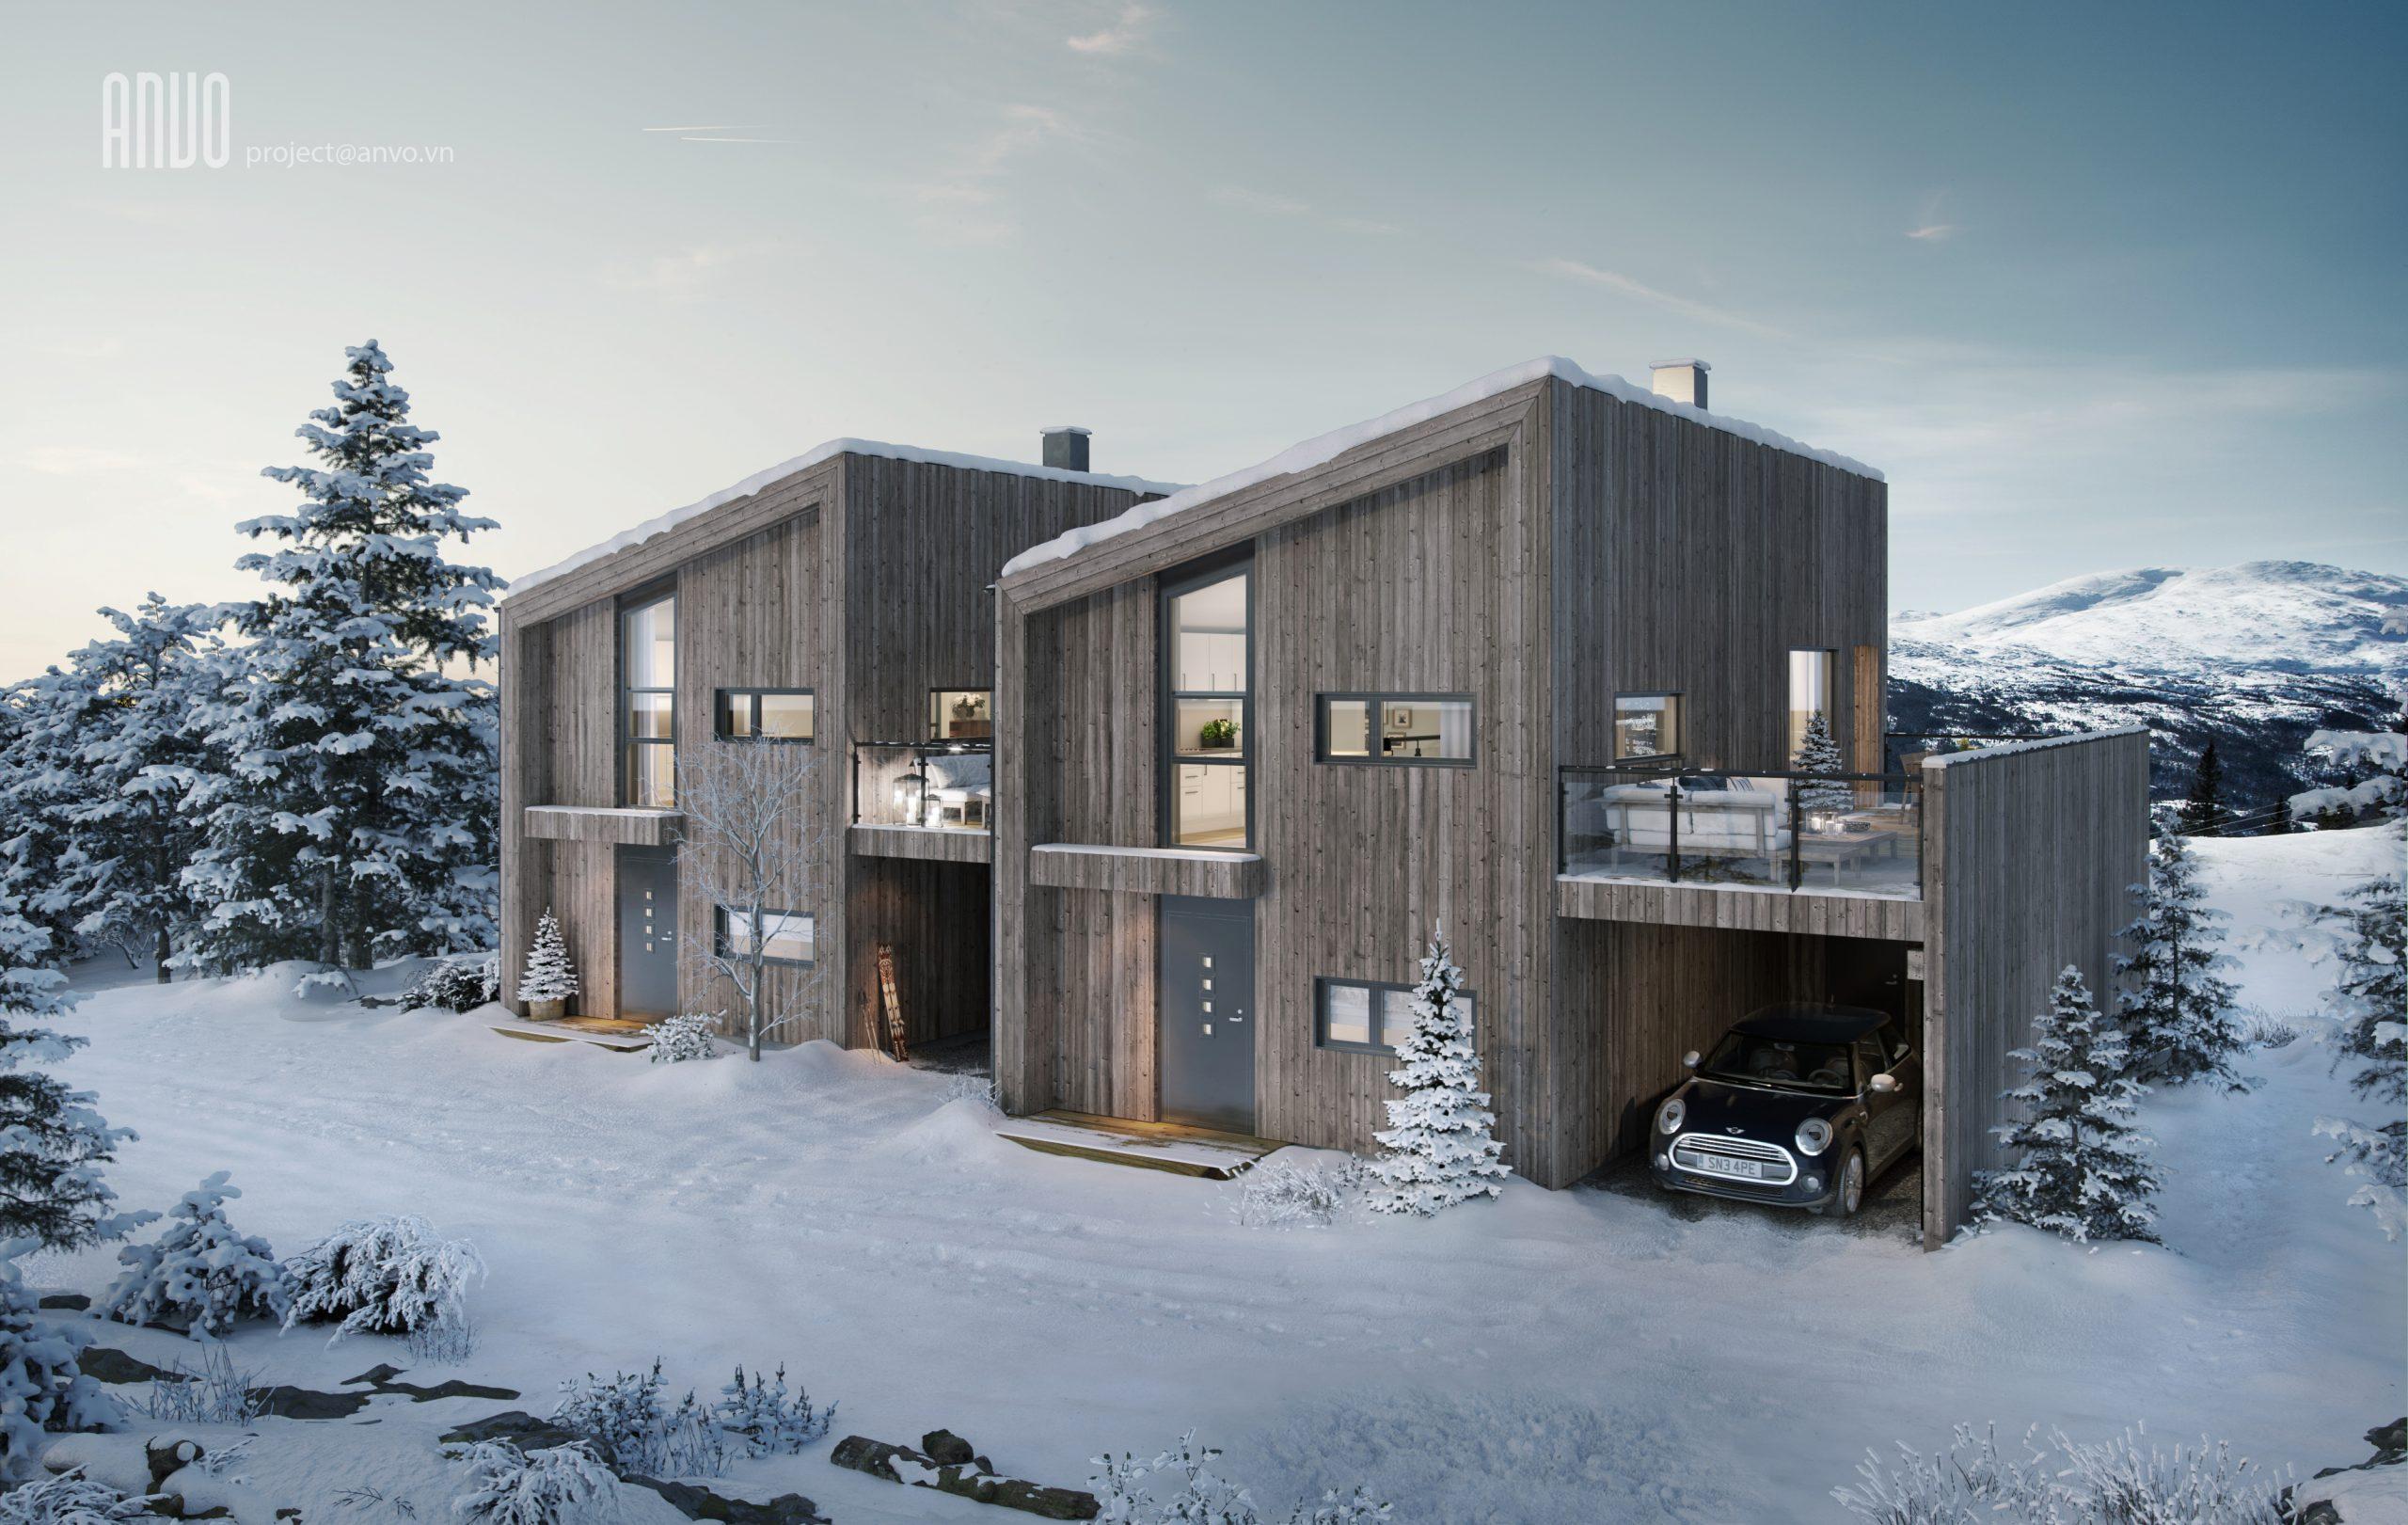 Cabin_Norway_anvo.vn_01